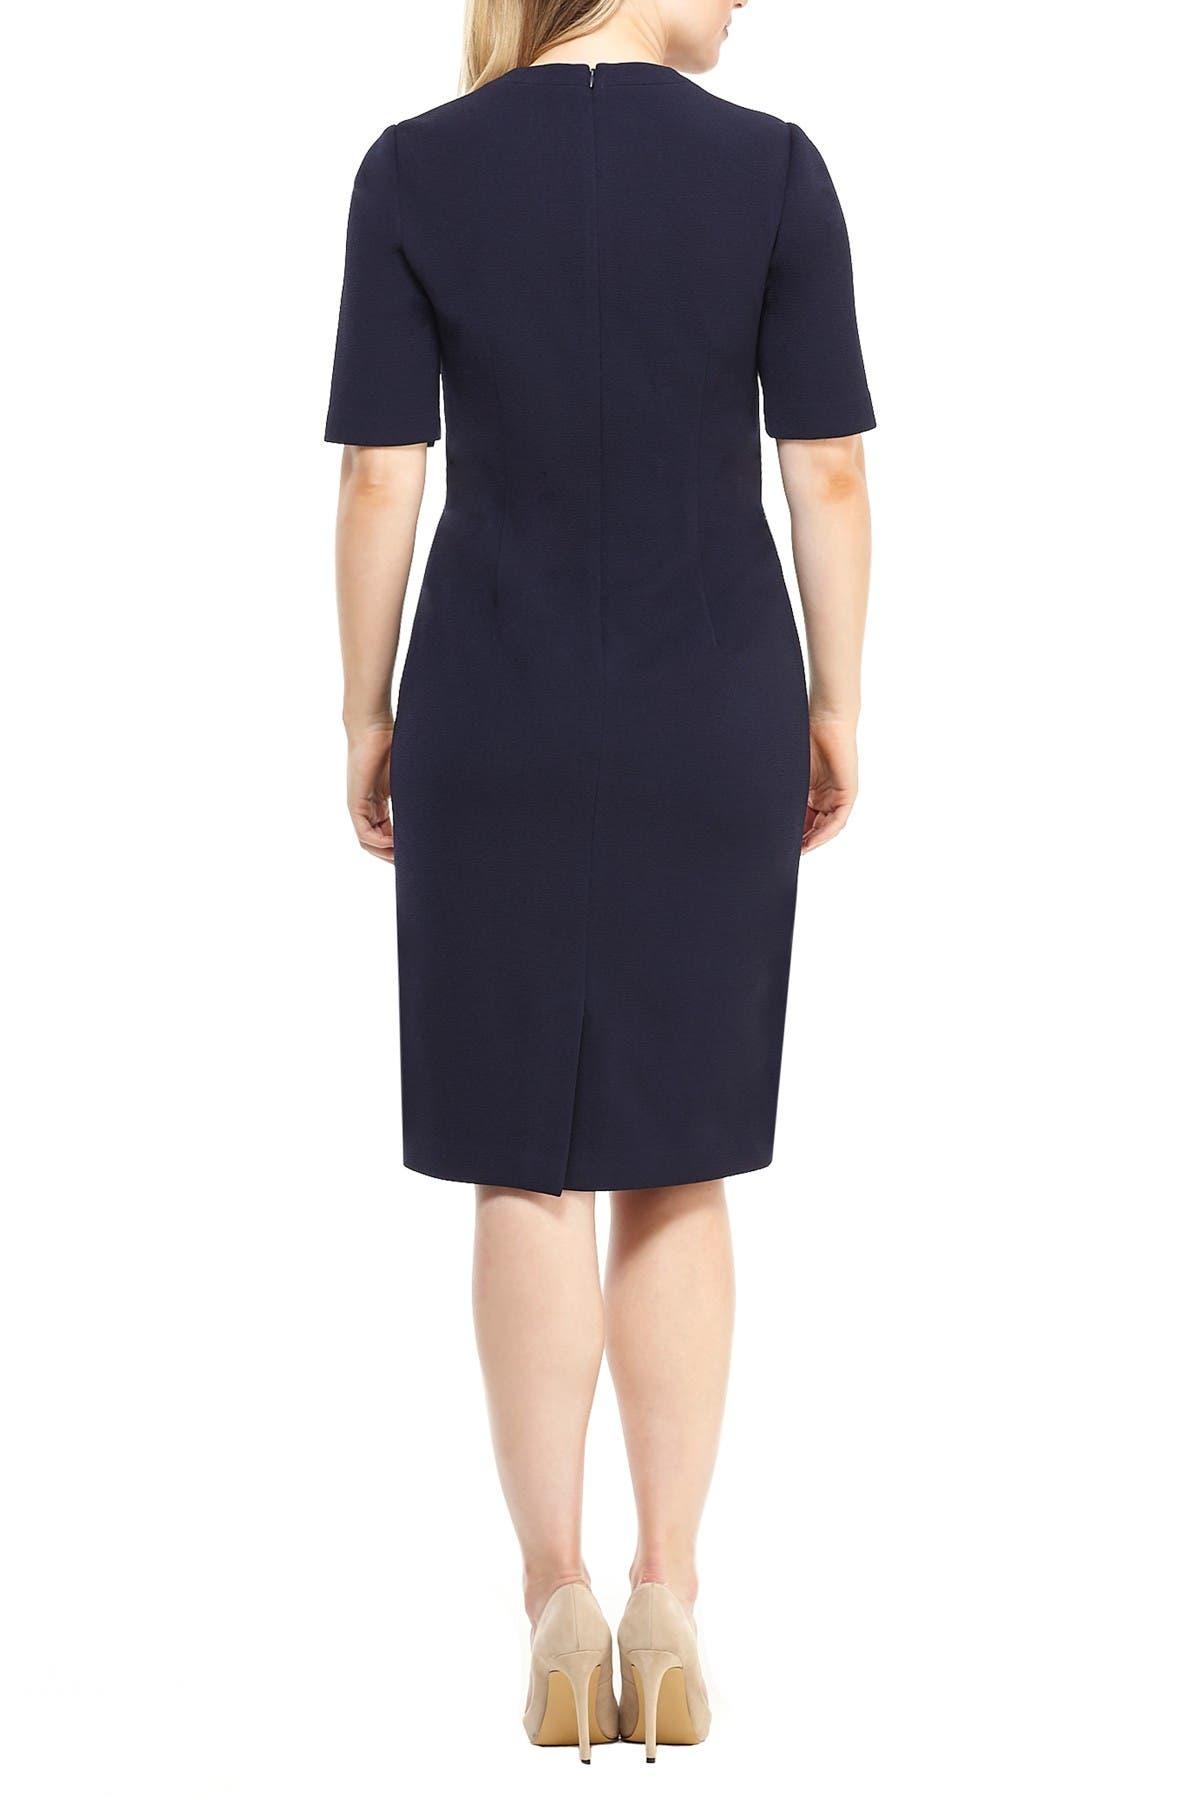 Image of Maggy London Portia V-Neck Sheath Dress